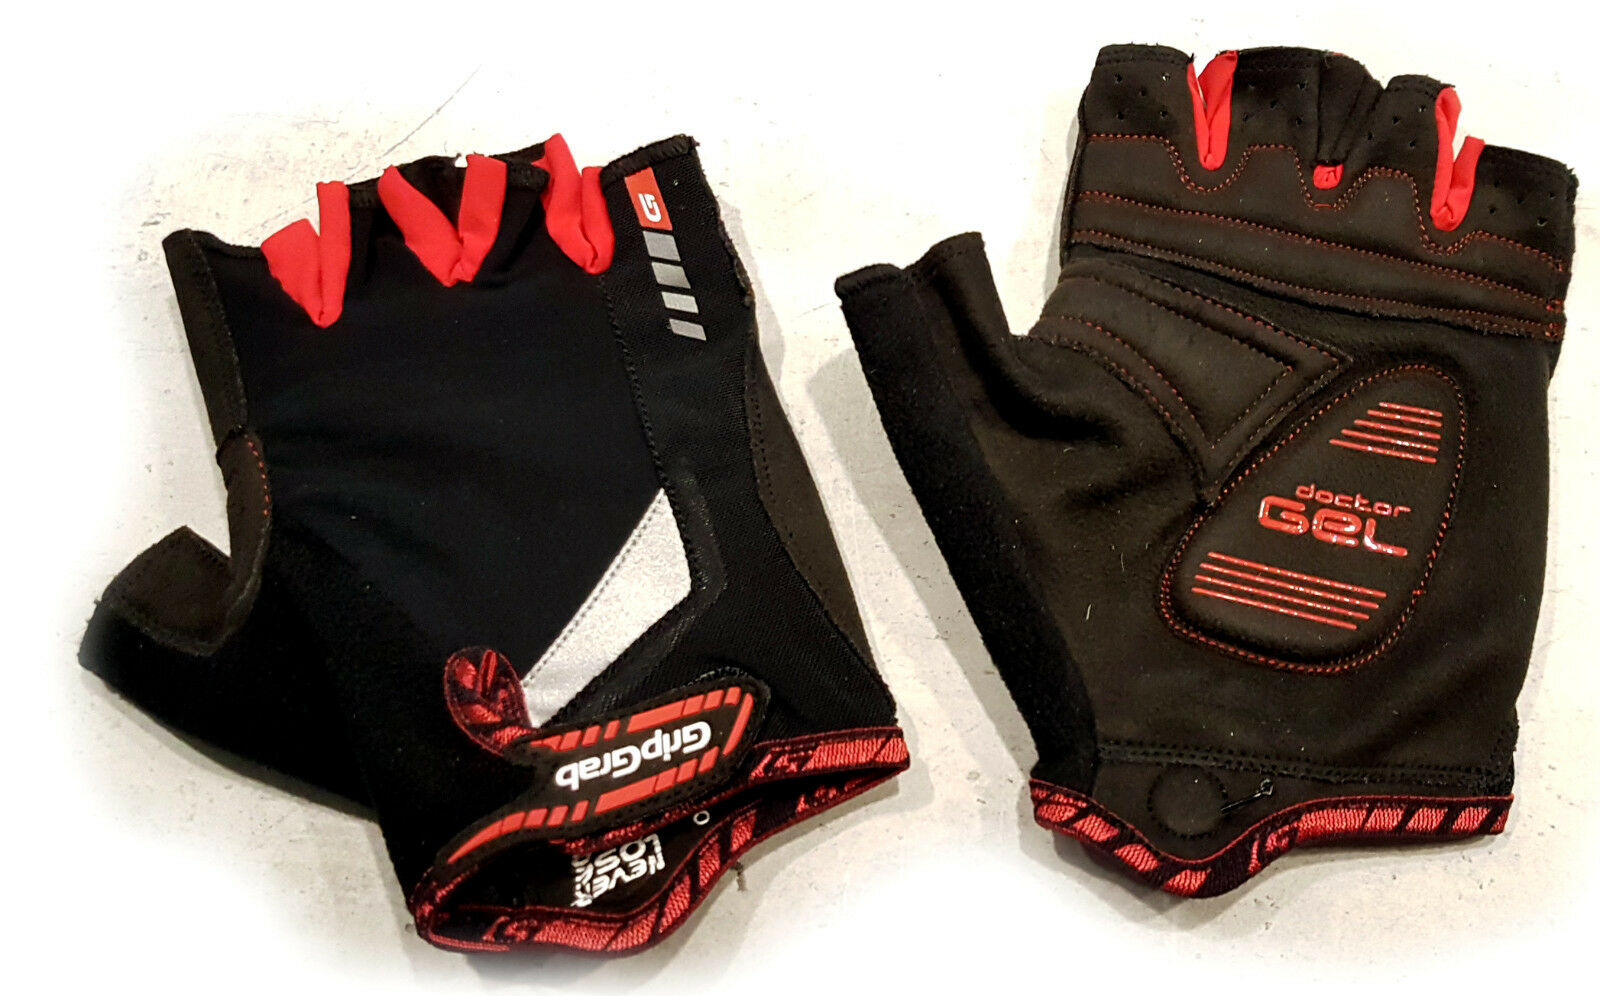 GripGrap Fahrrad Handschuhe SUPERGEL SUPERGEL SUPERGEL  - Handschuh Kurz 930231